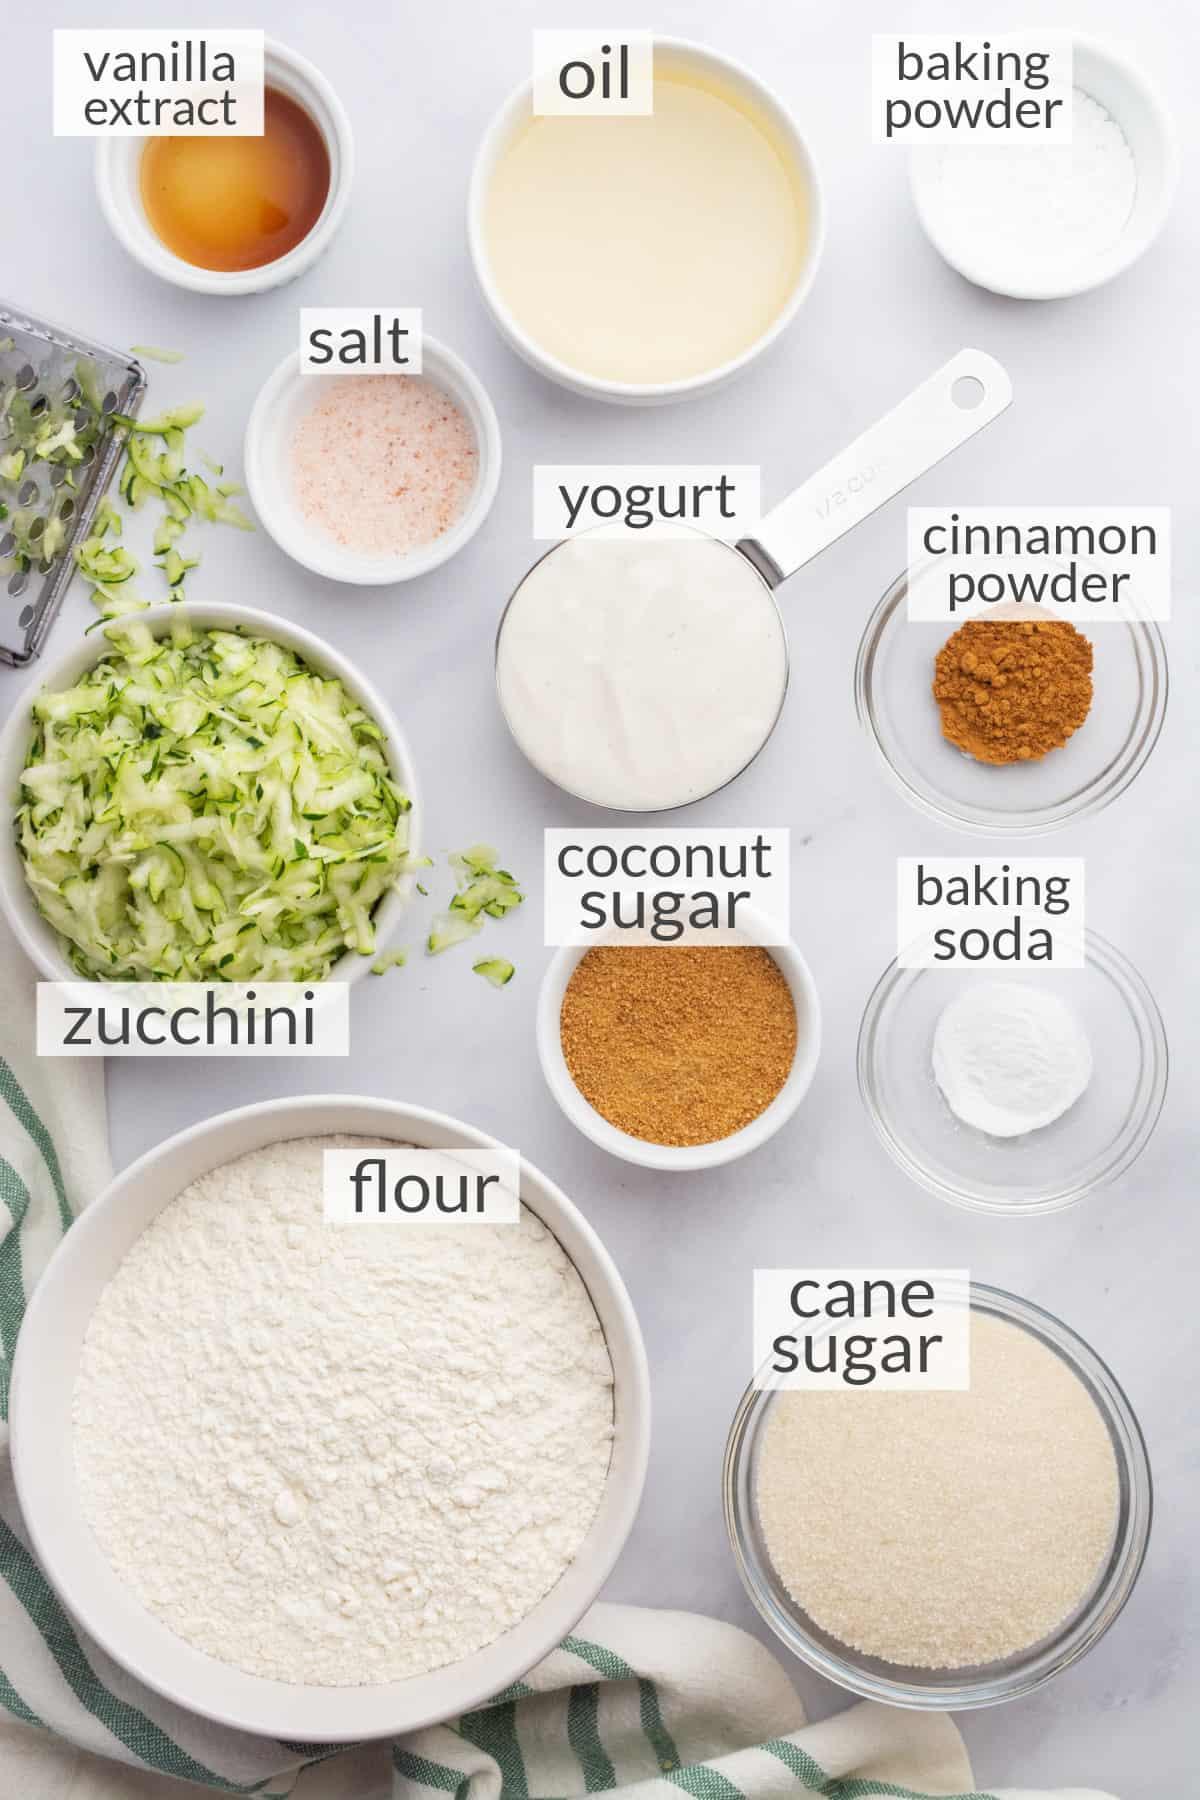 Ingredients needed to make vegan zucchini bread.